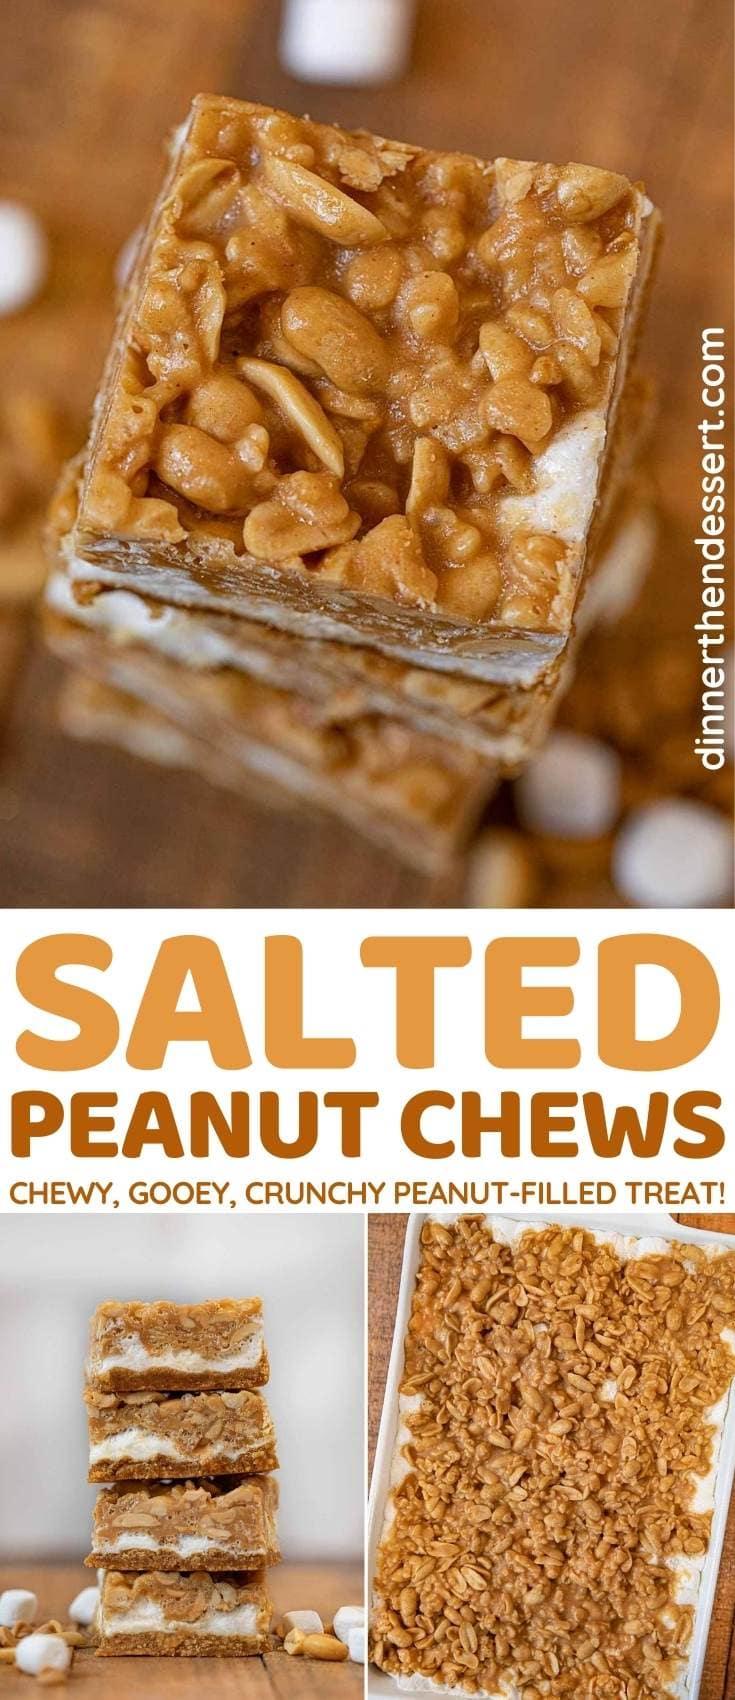 Salted Peanut Chews collage